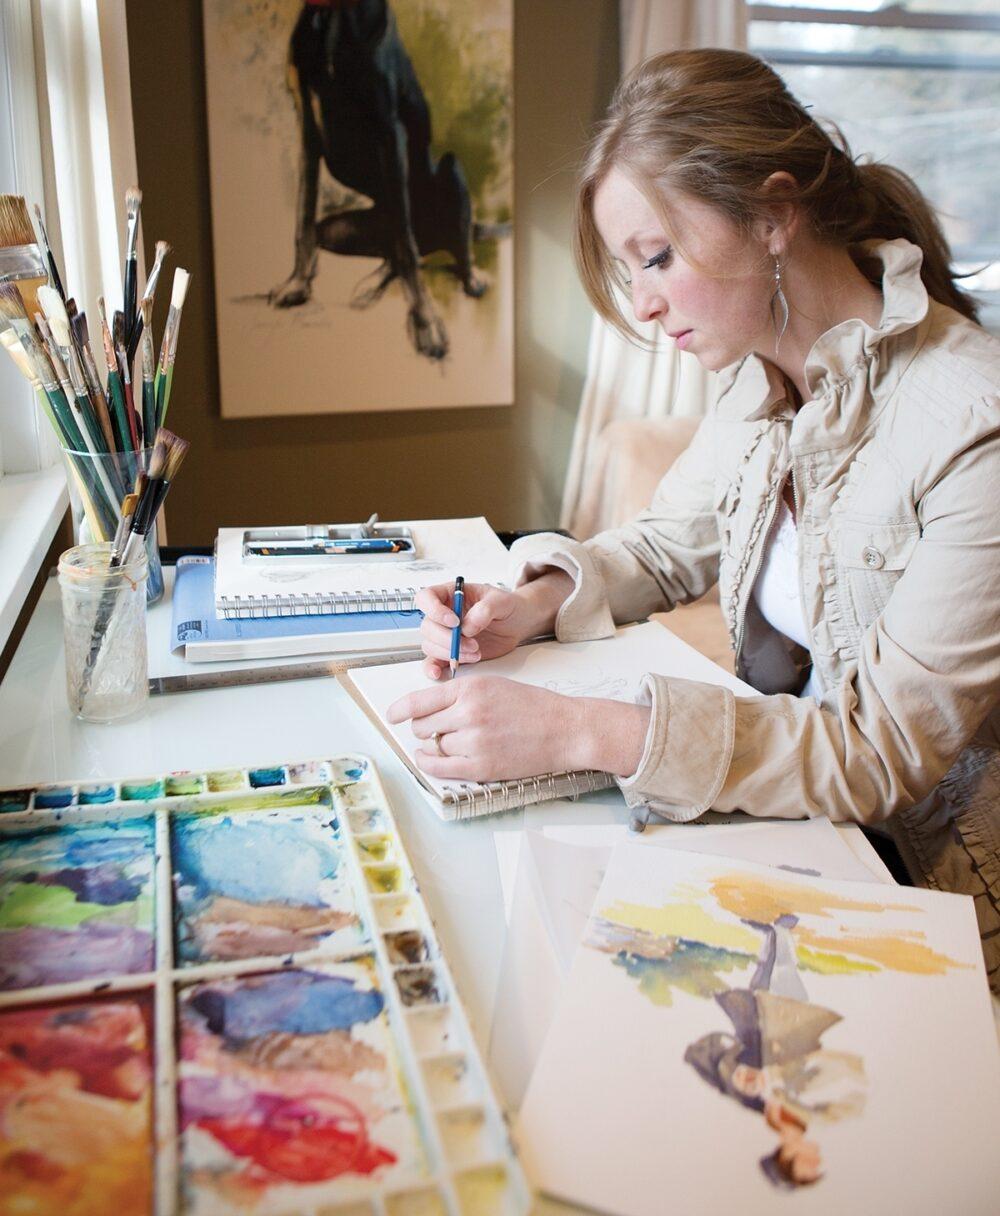 Jennifer Brandon, an illustrator for Lamplighter Publishing, sketches an illustration.